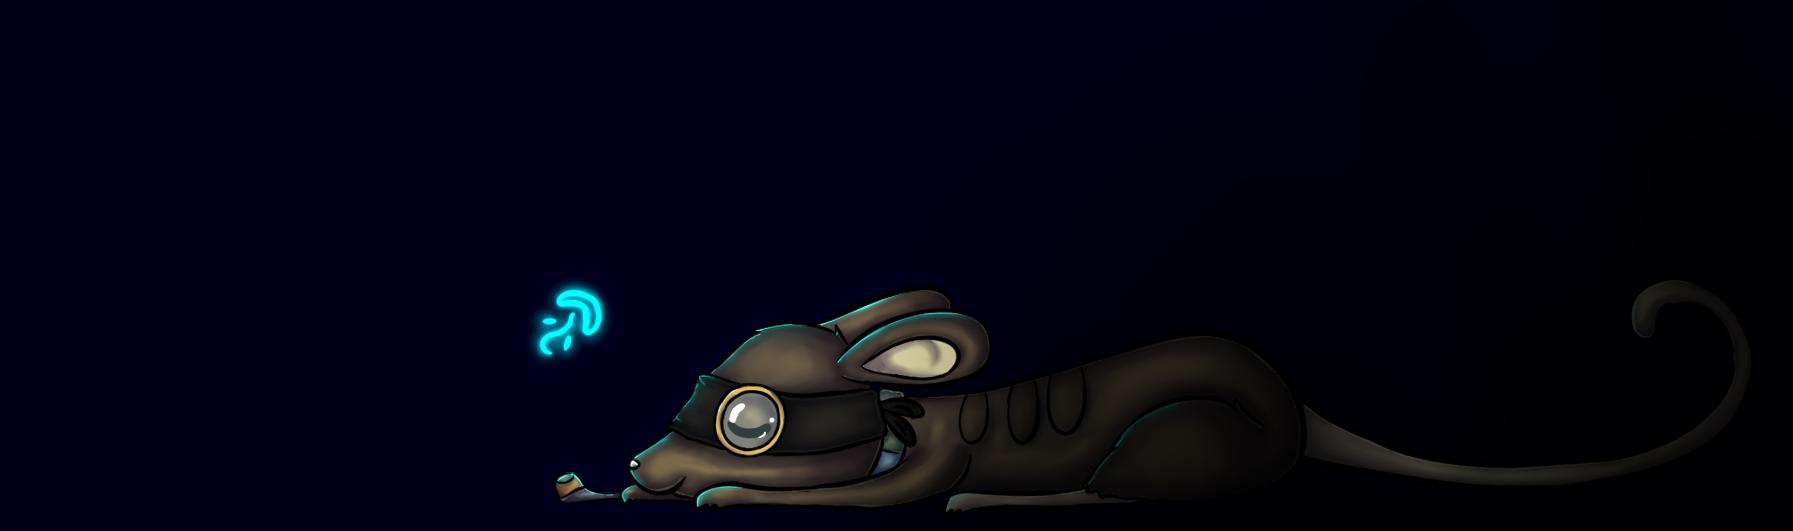 Sleepy Vulli by pompomball